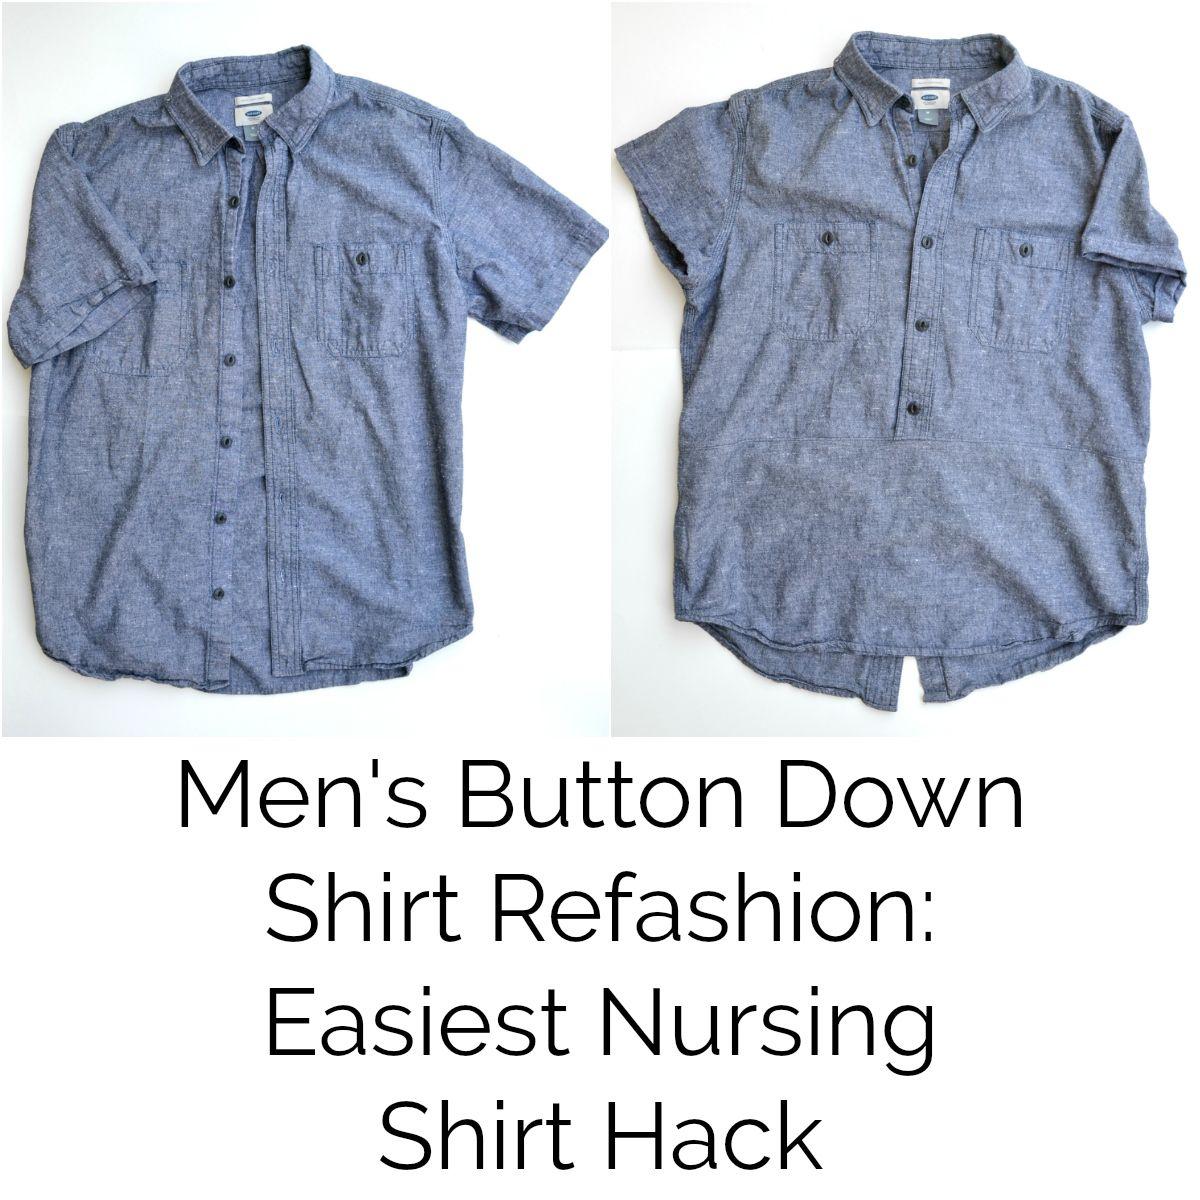 fd1c338581 Easiest Nursing Shirt Hack  Men s Button Down Shirt Refashion     DIYmaternity.com